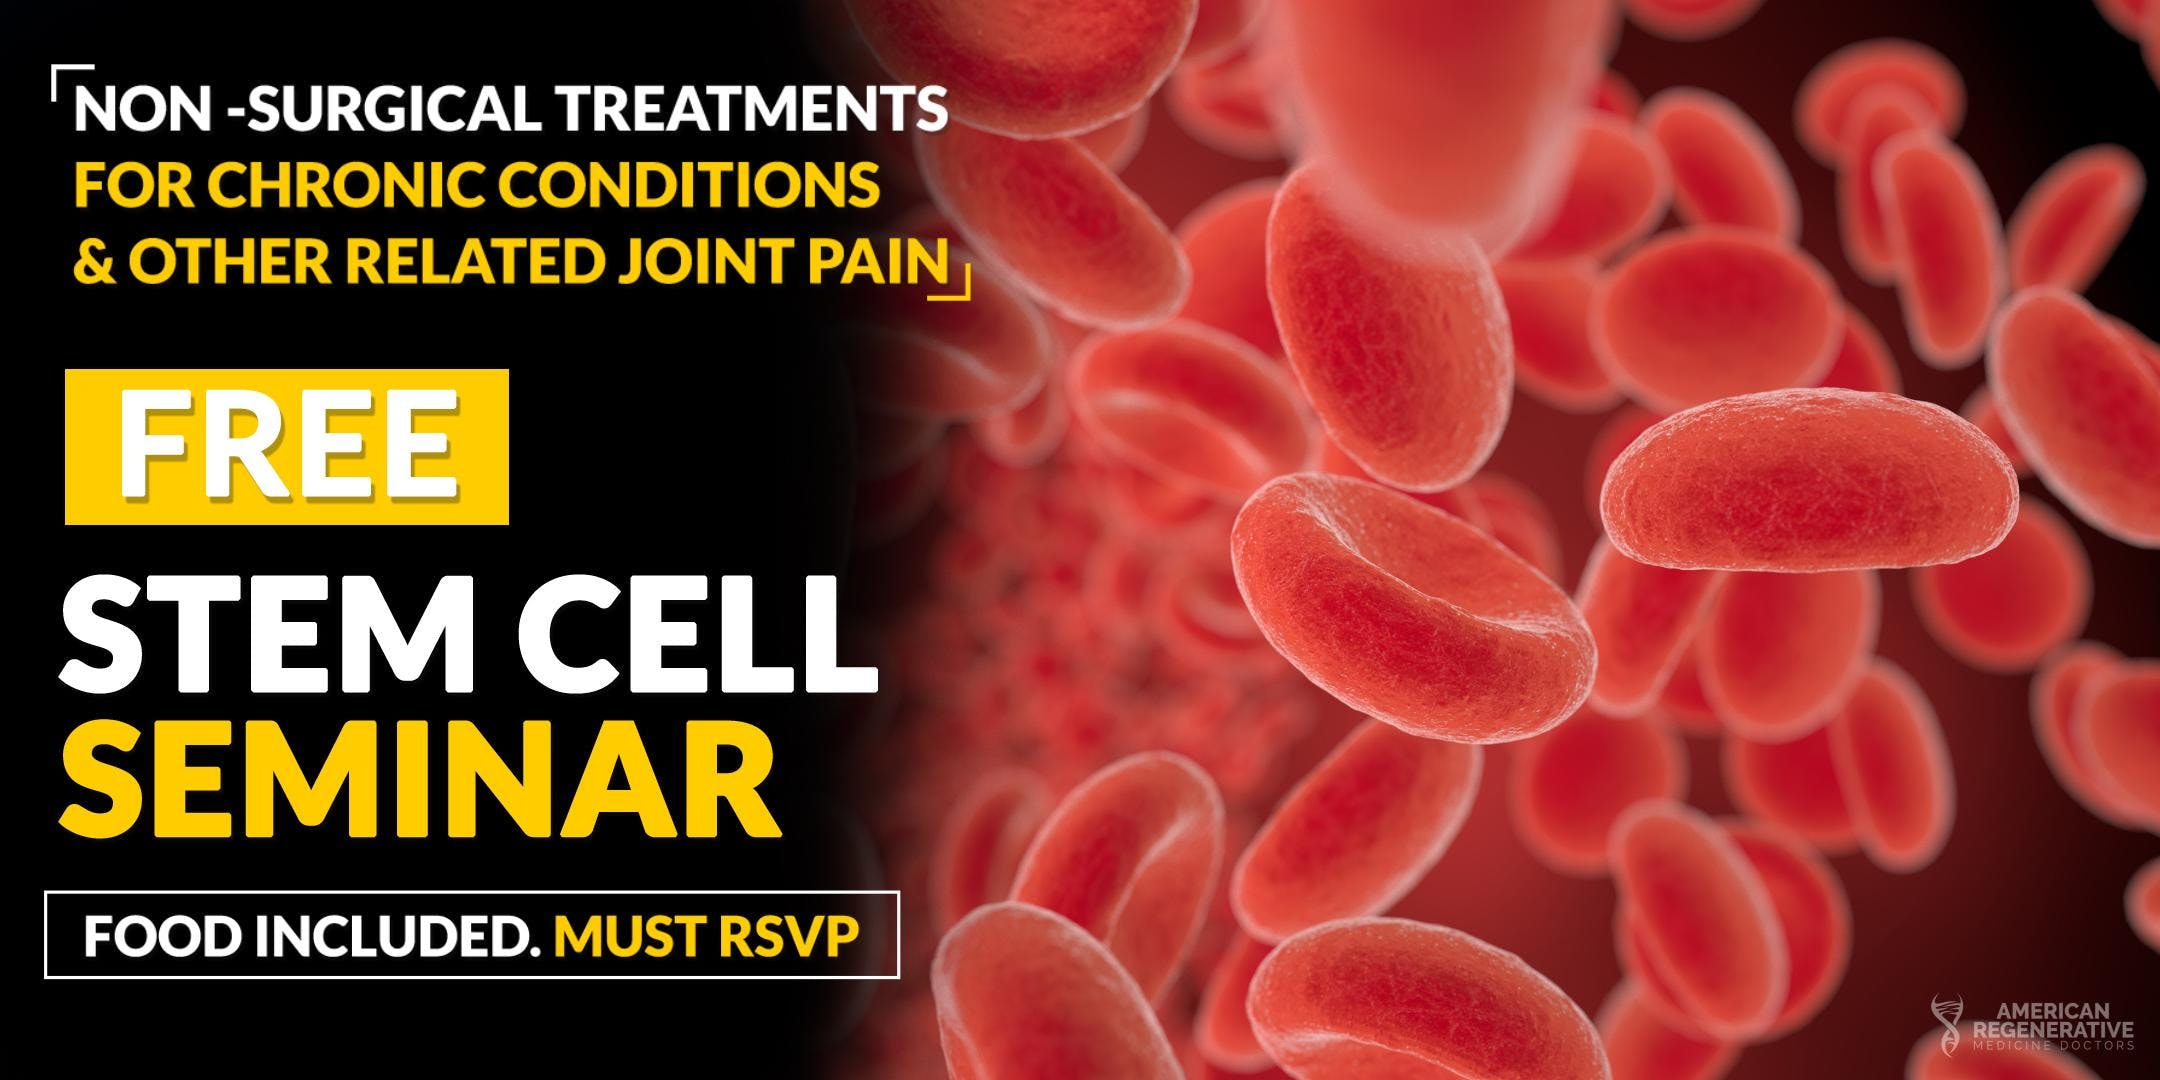 FREE Regenerative Stem Cell Seminar for Pain